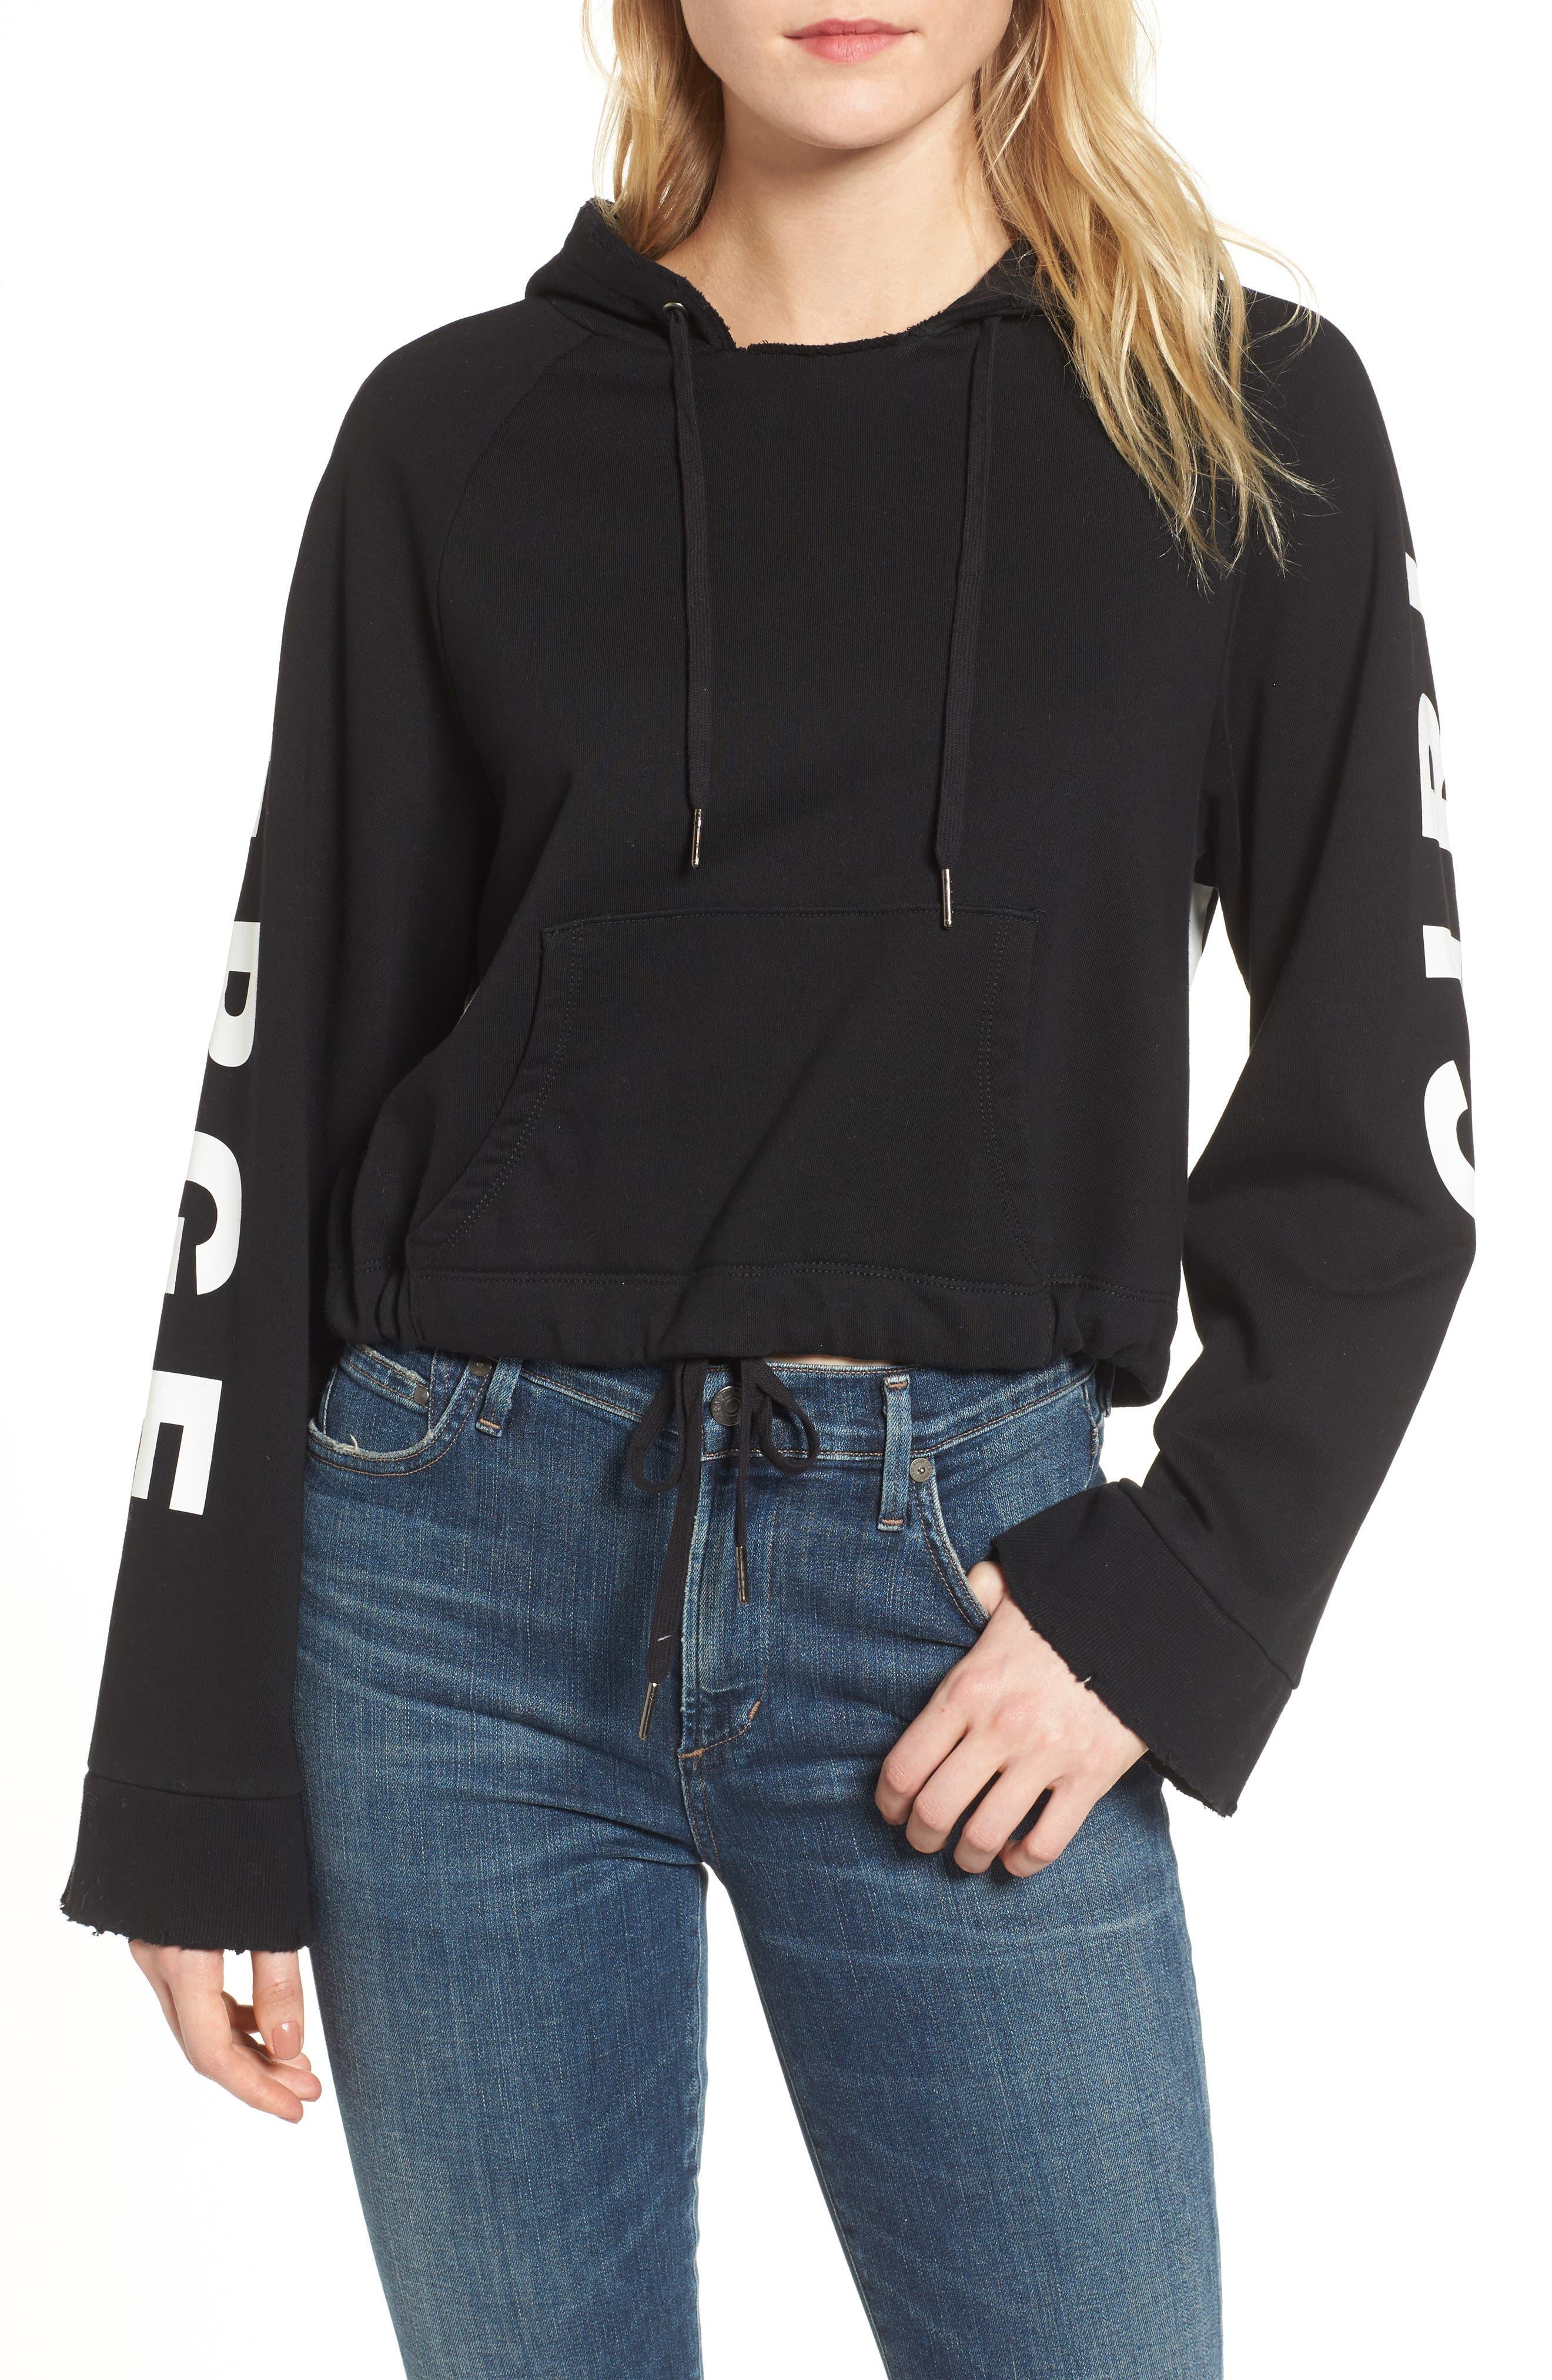 Girl on the Verge Crop Sweatshirt,                             Main thumbnail 1, color,                             Black